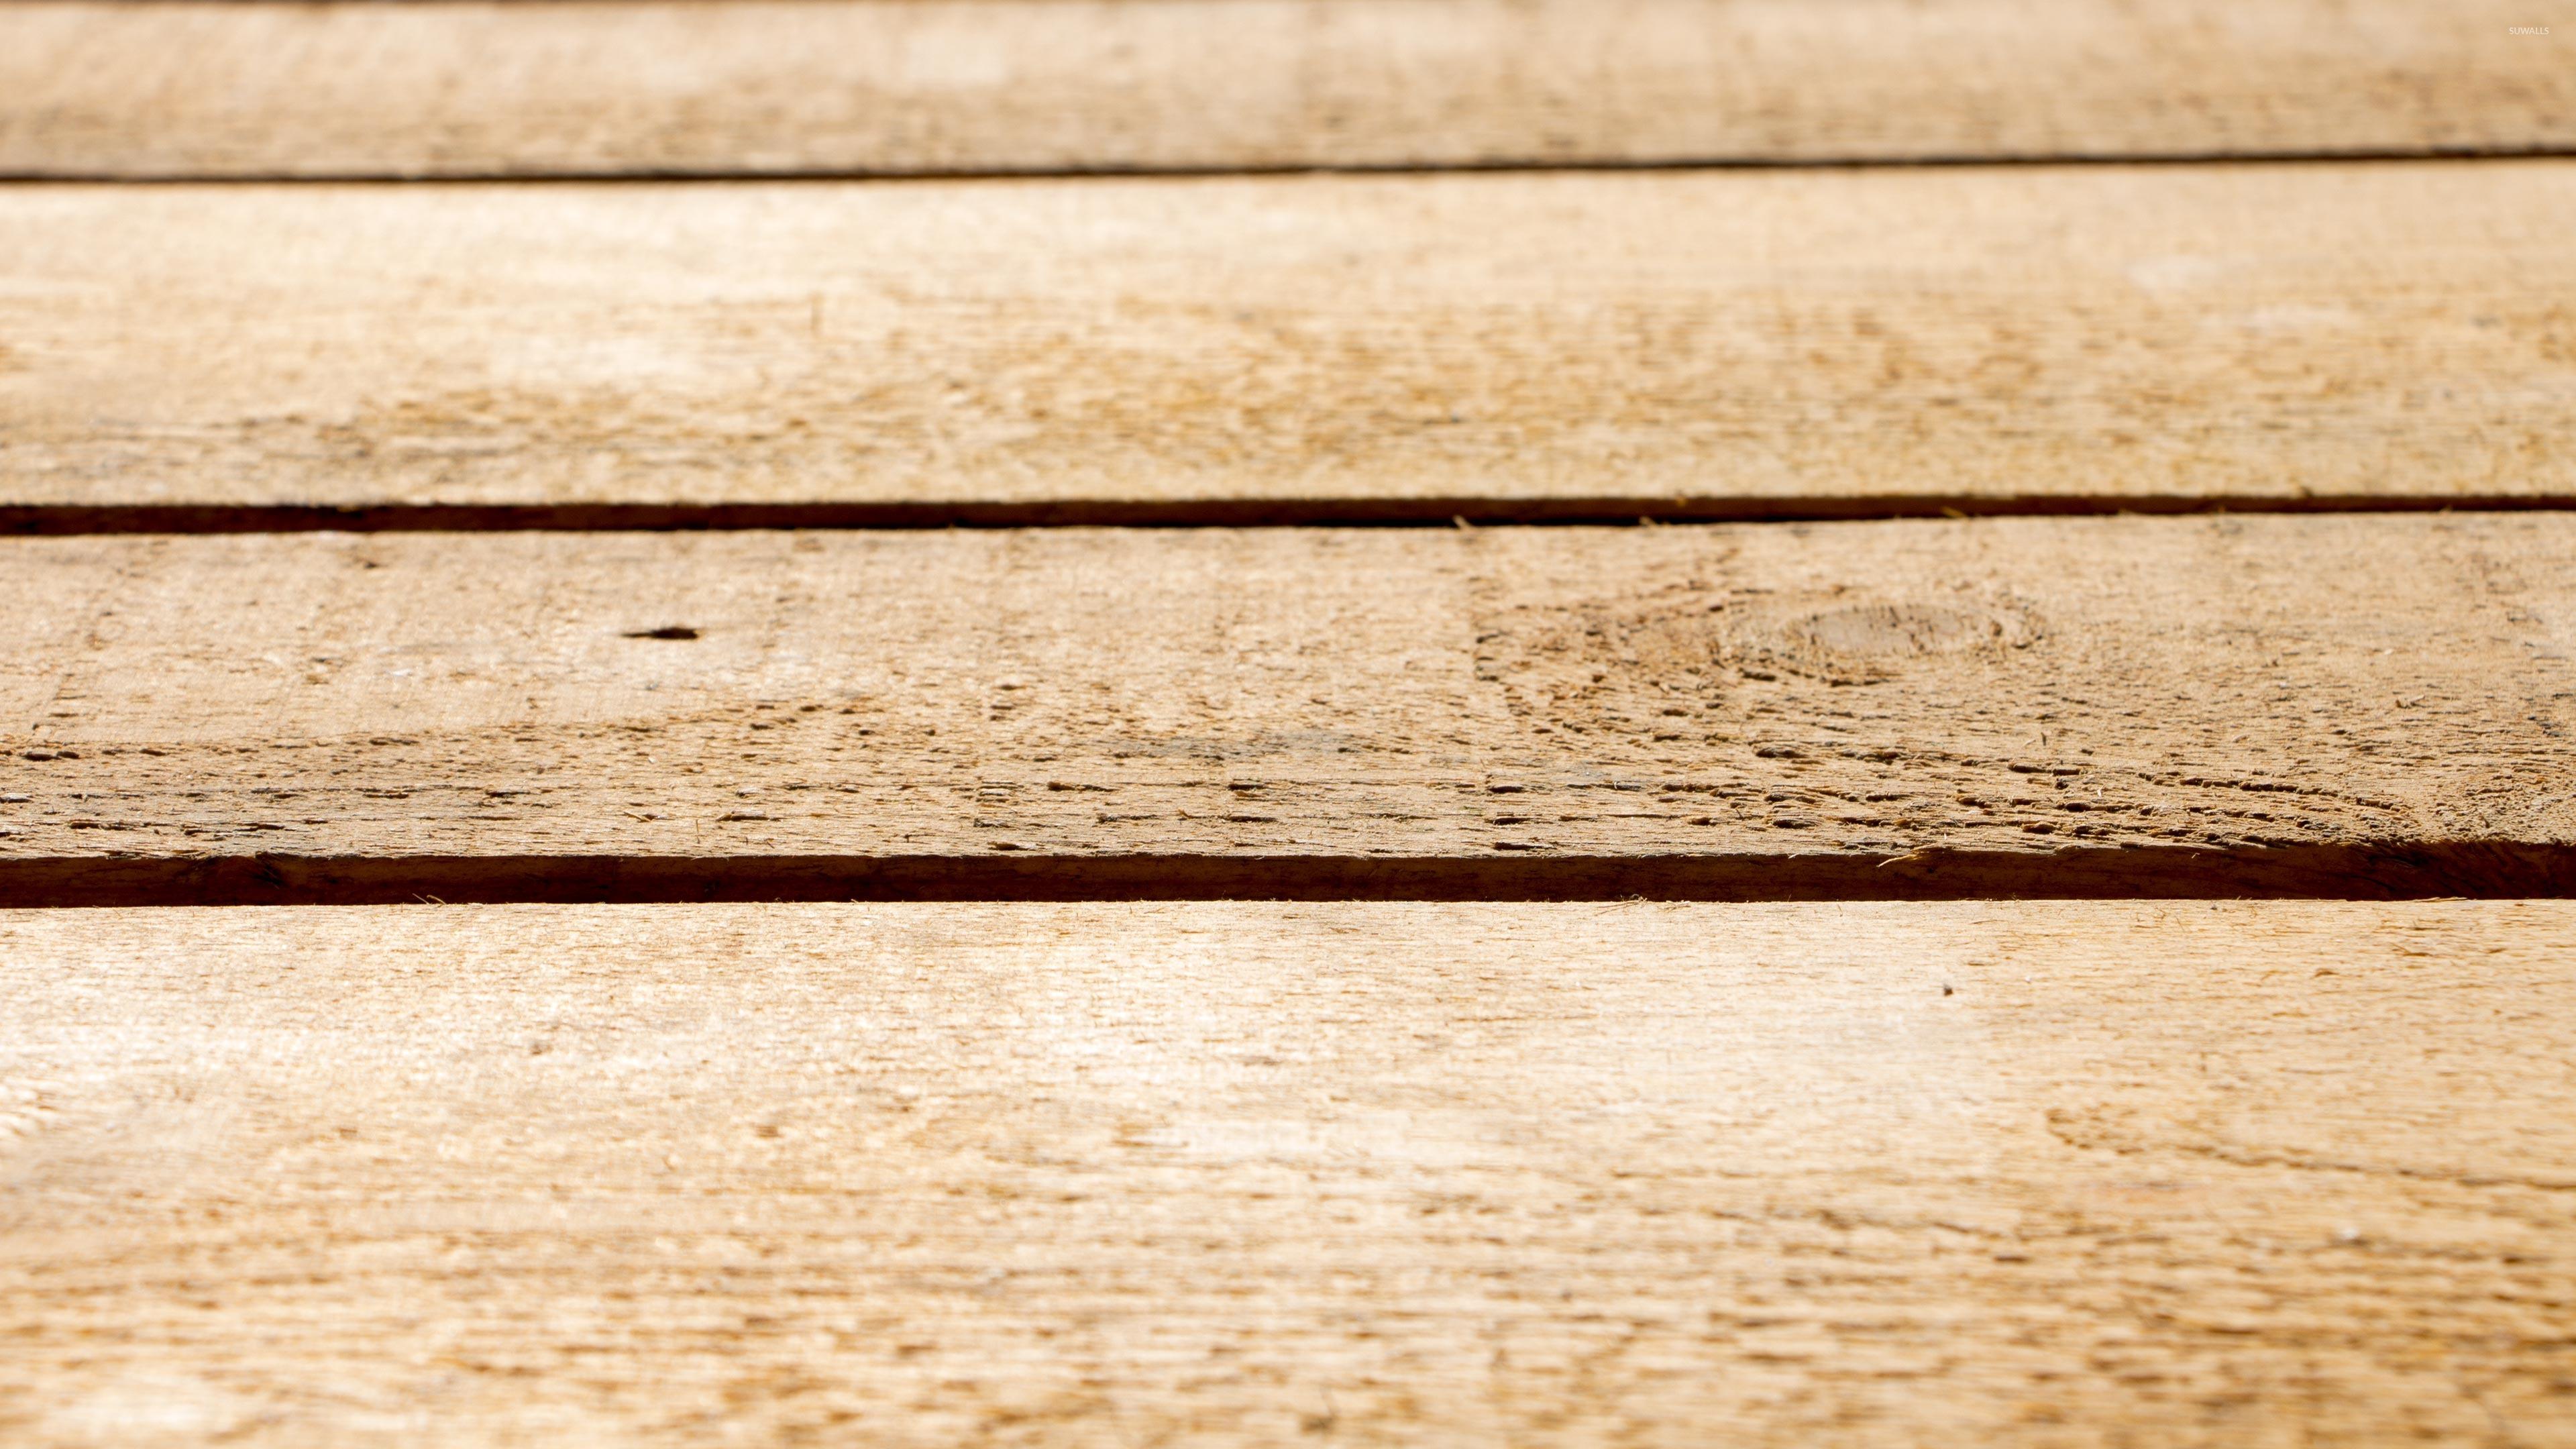 Wooden dock wallpaper - Photography wallpapers - #49975